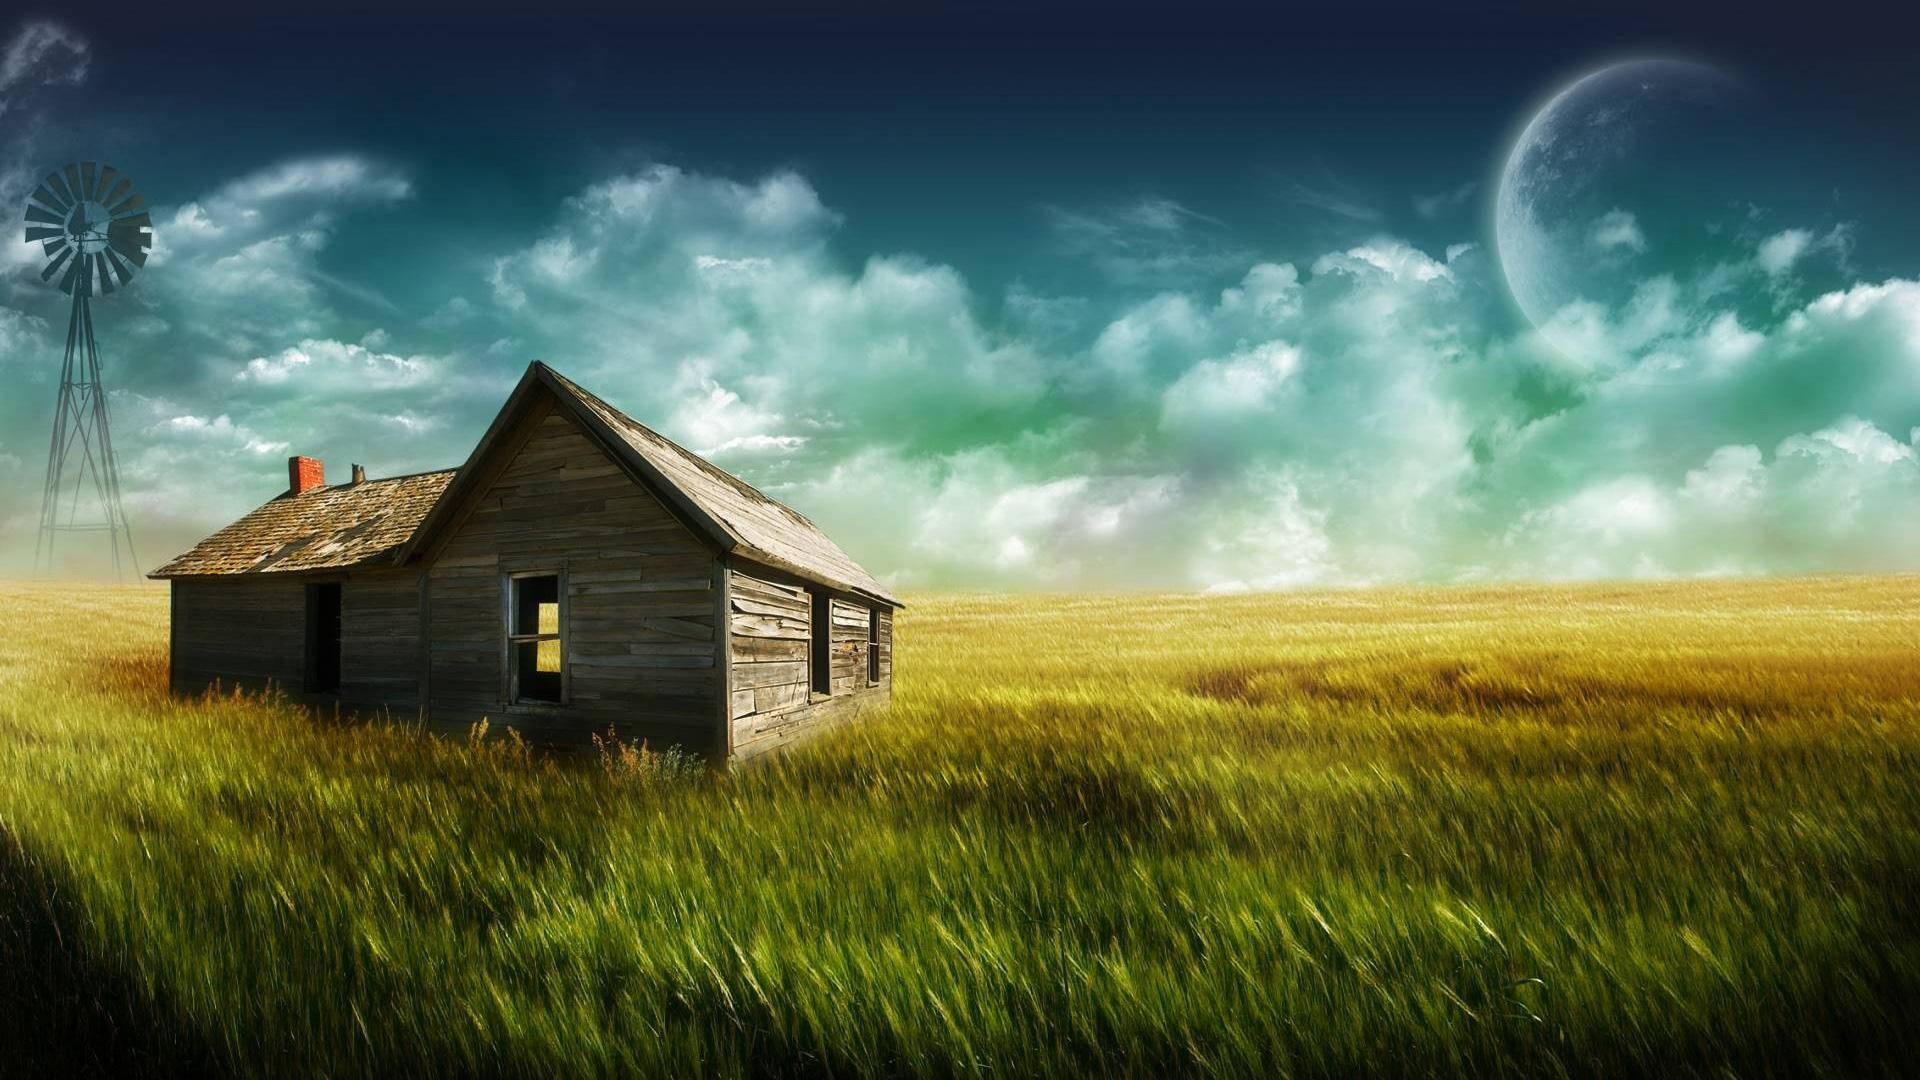 Farm house Full HD 1080p wallpaper Fantasy sky 1920x1080